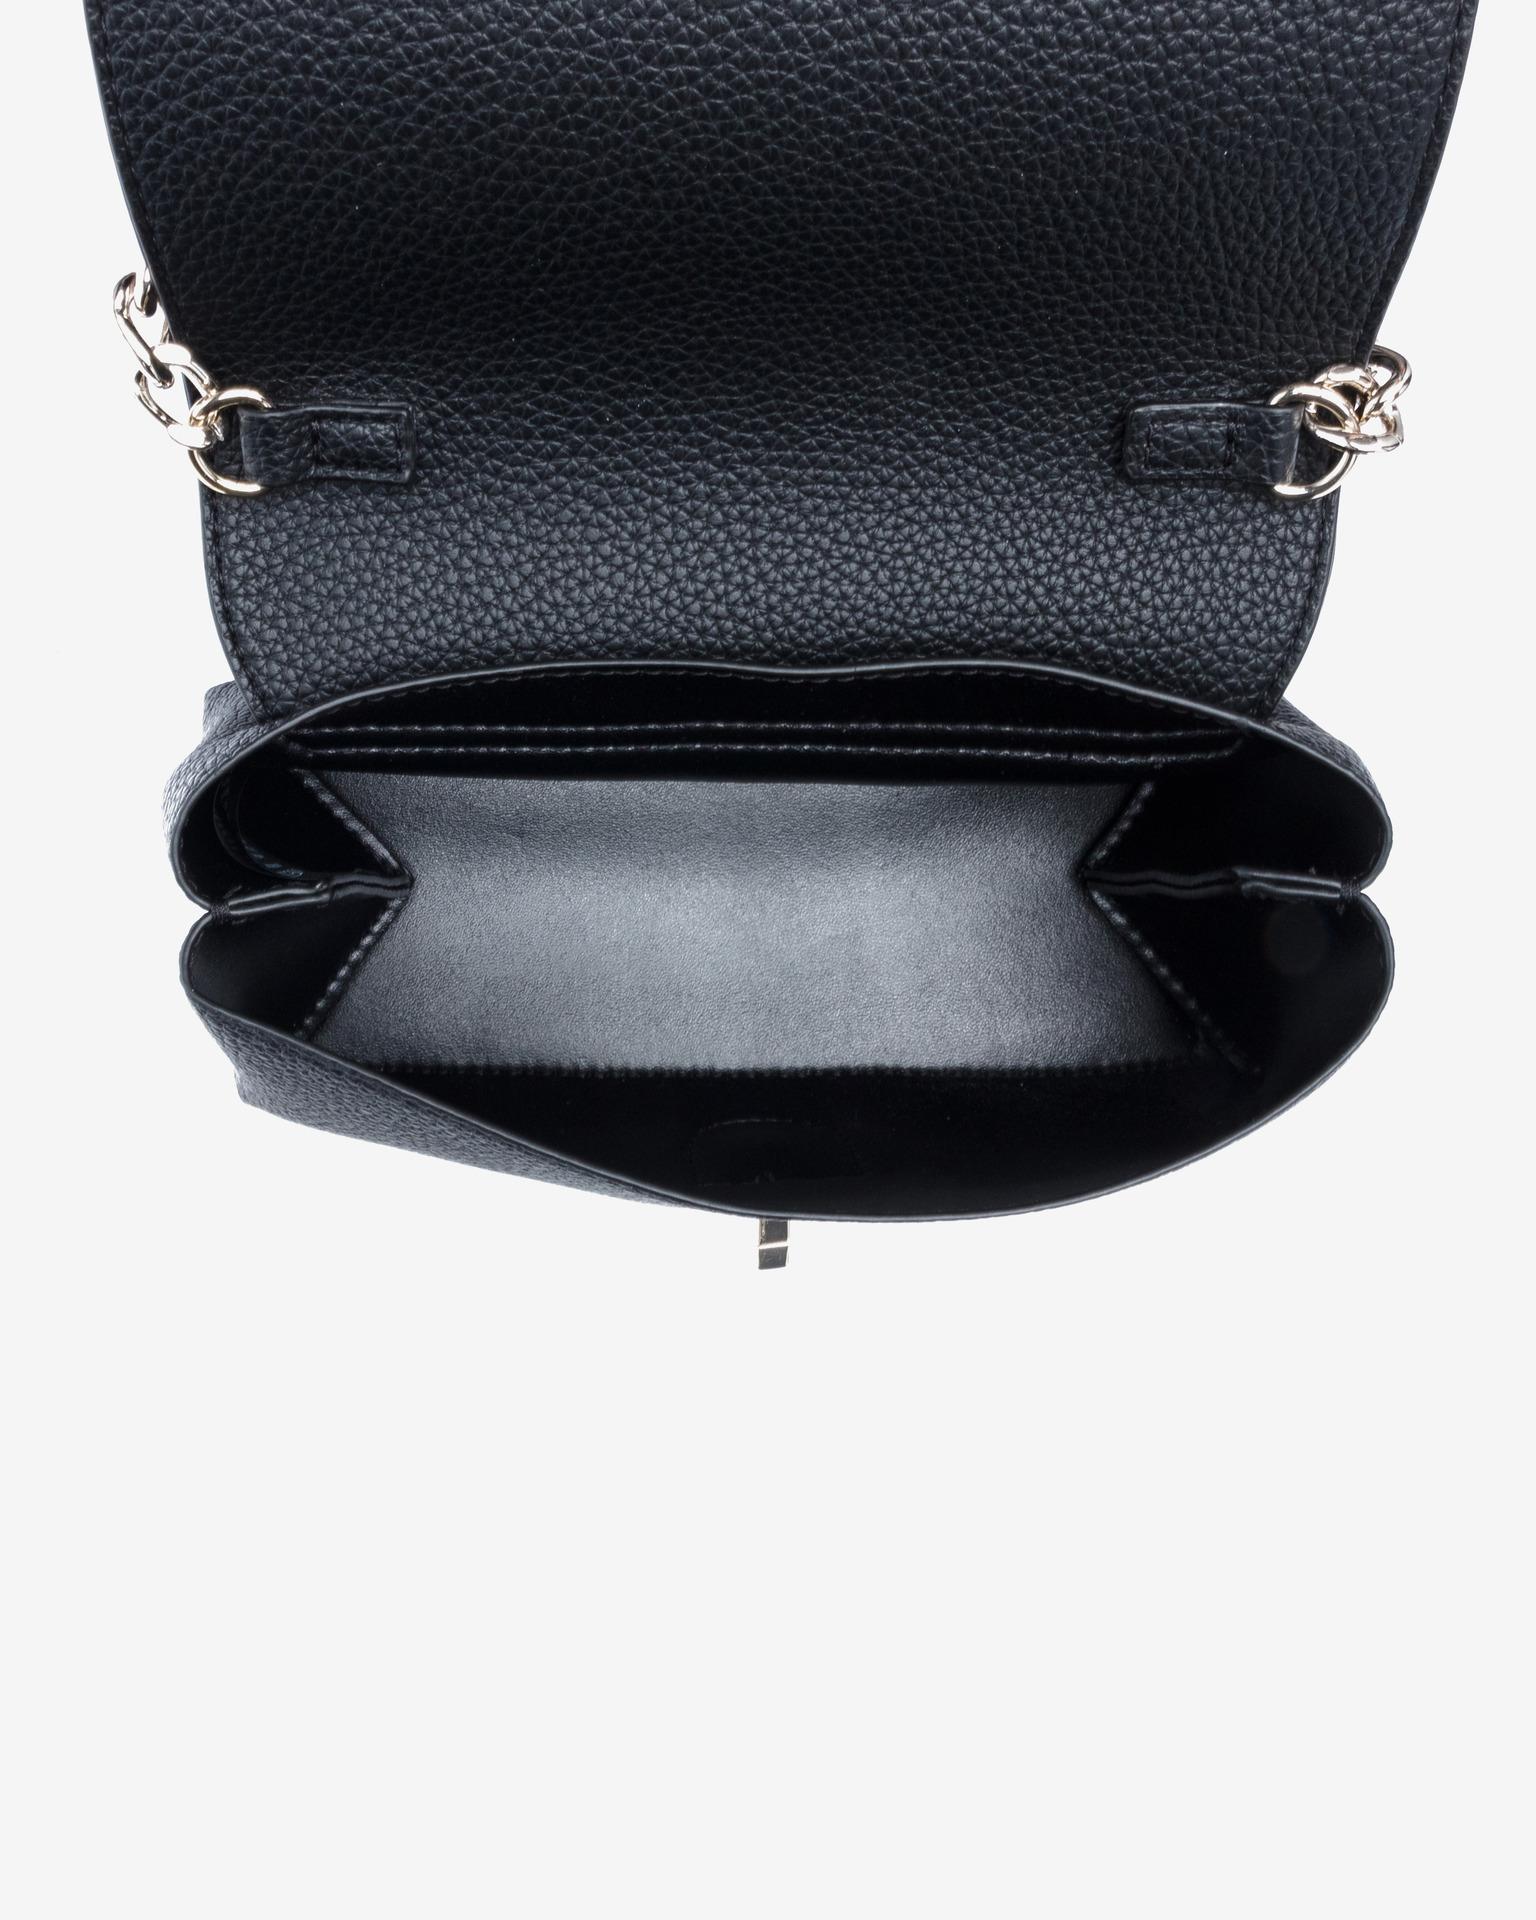 Guess černé crossbody kabelka Uptown Chic Mini